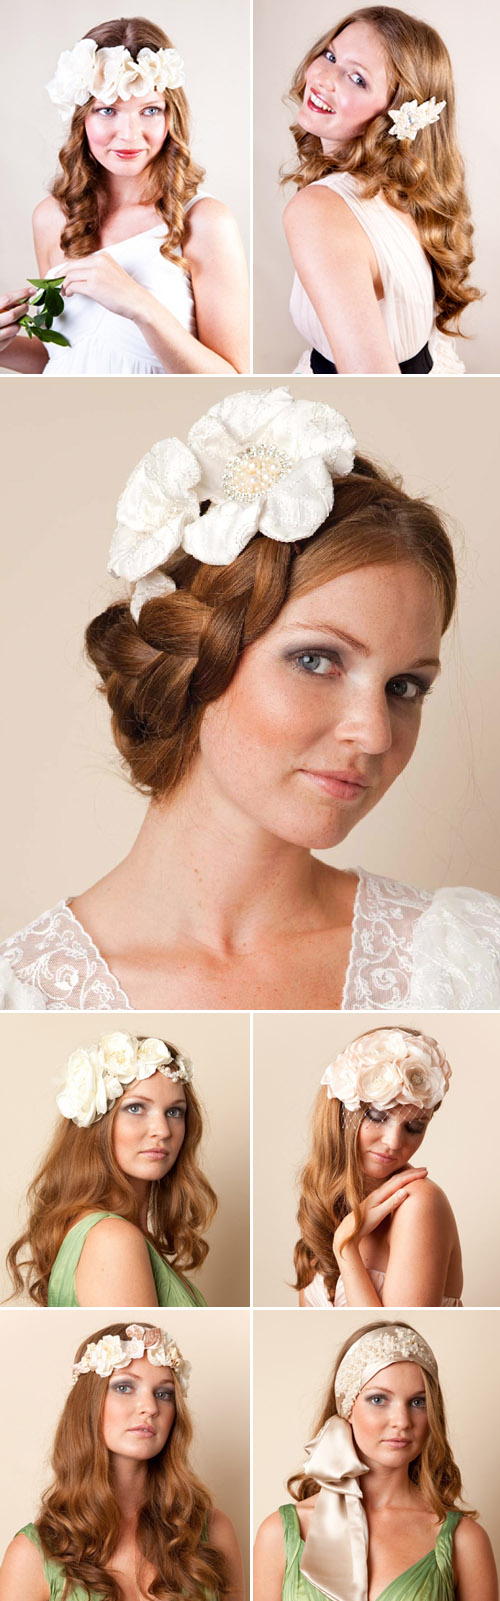 Bridal Hair Accessories NYC